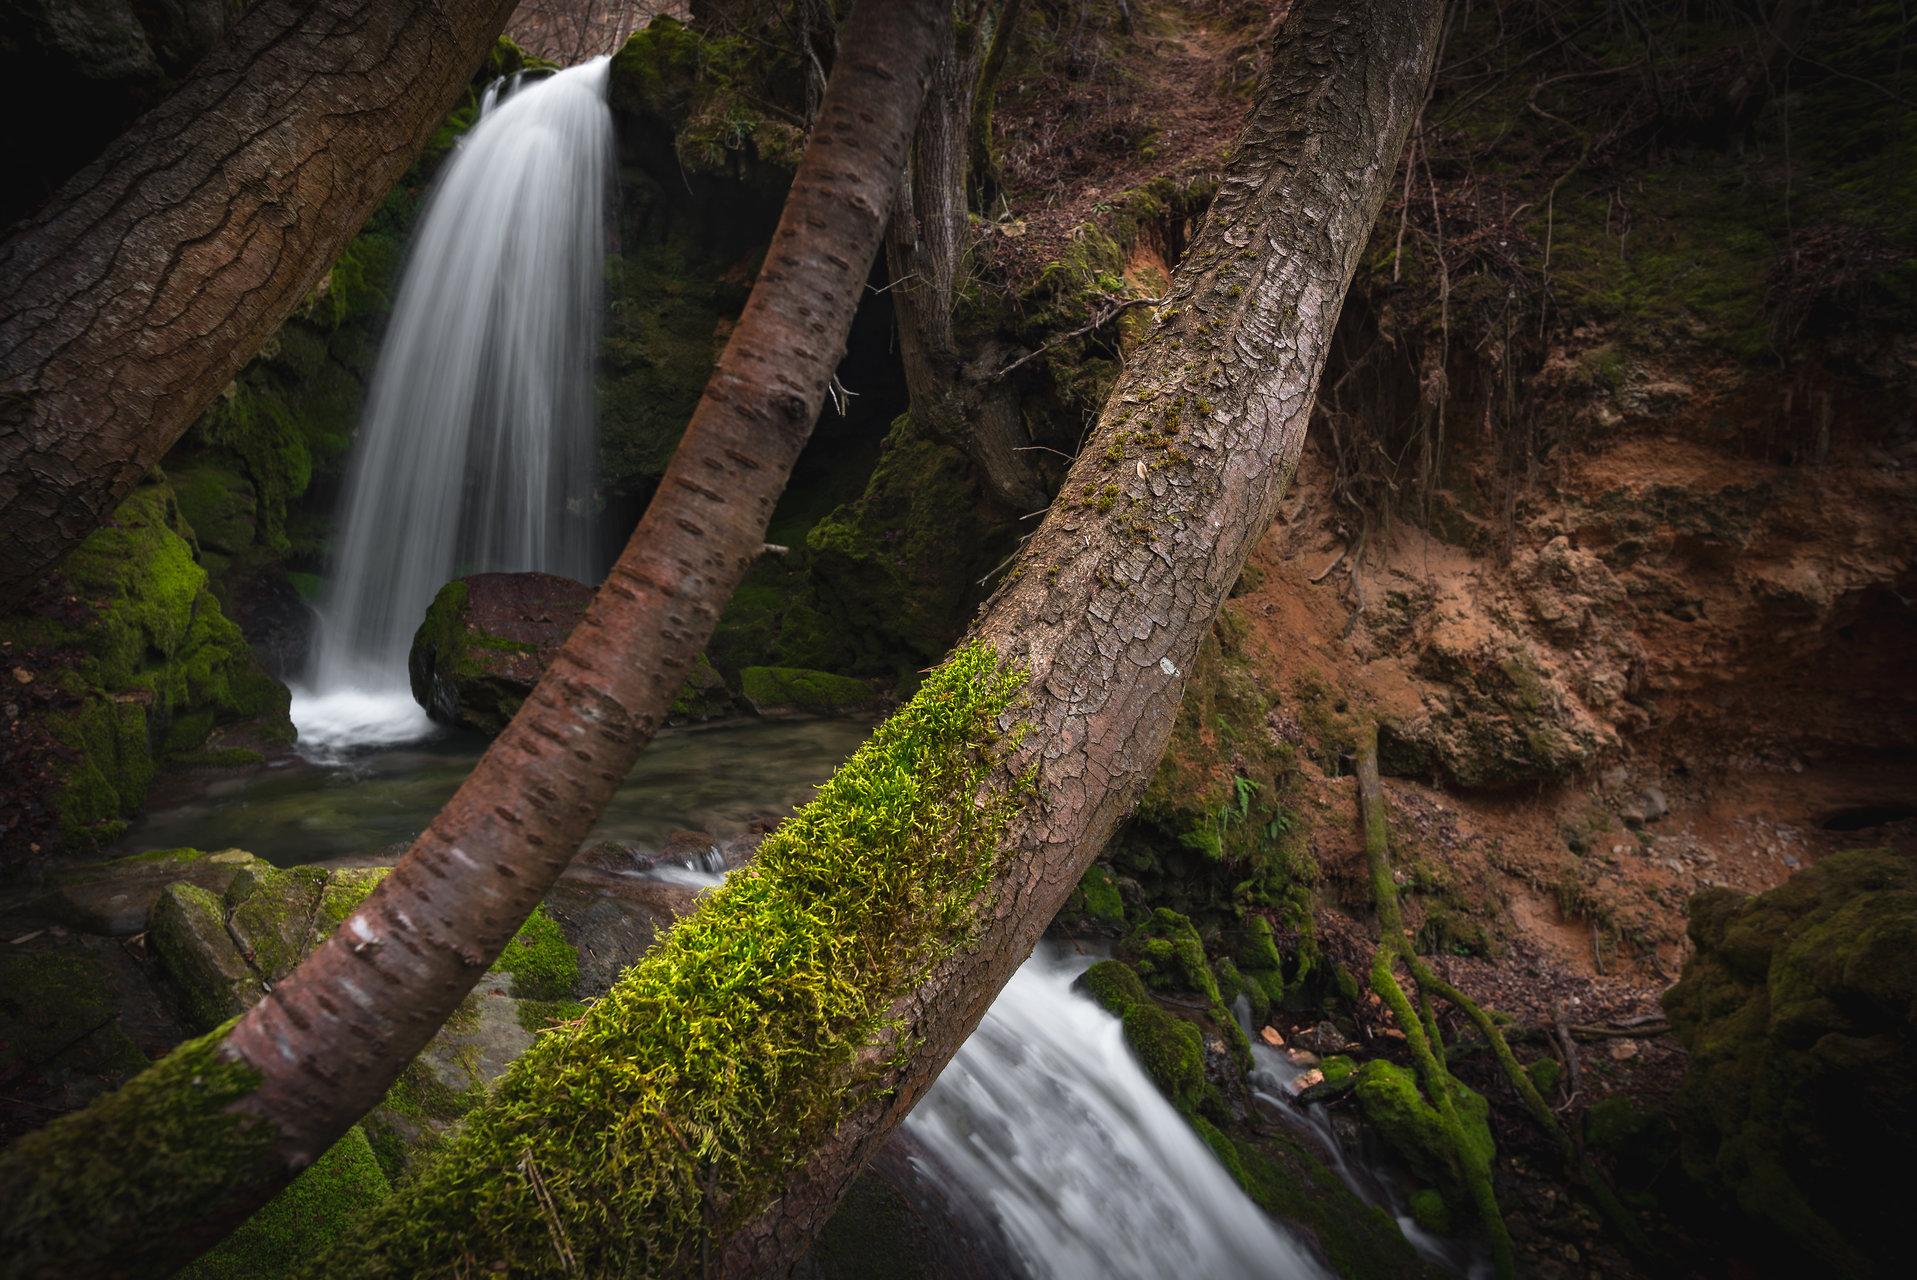 Photo in Nature | Author Mariyana Atanasova - Lucero | PHOTO FORUM